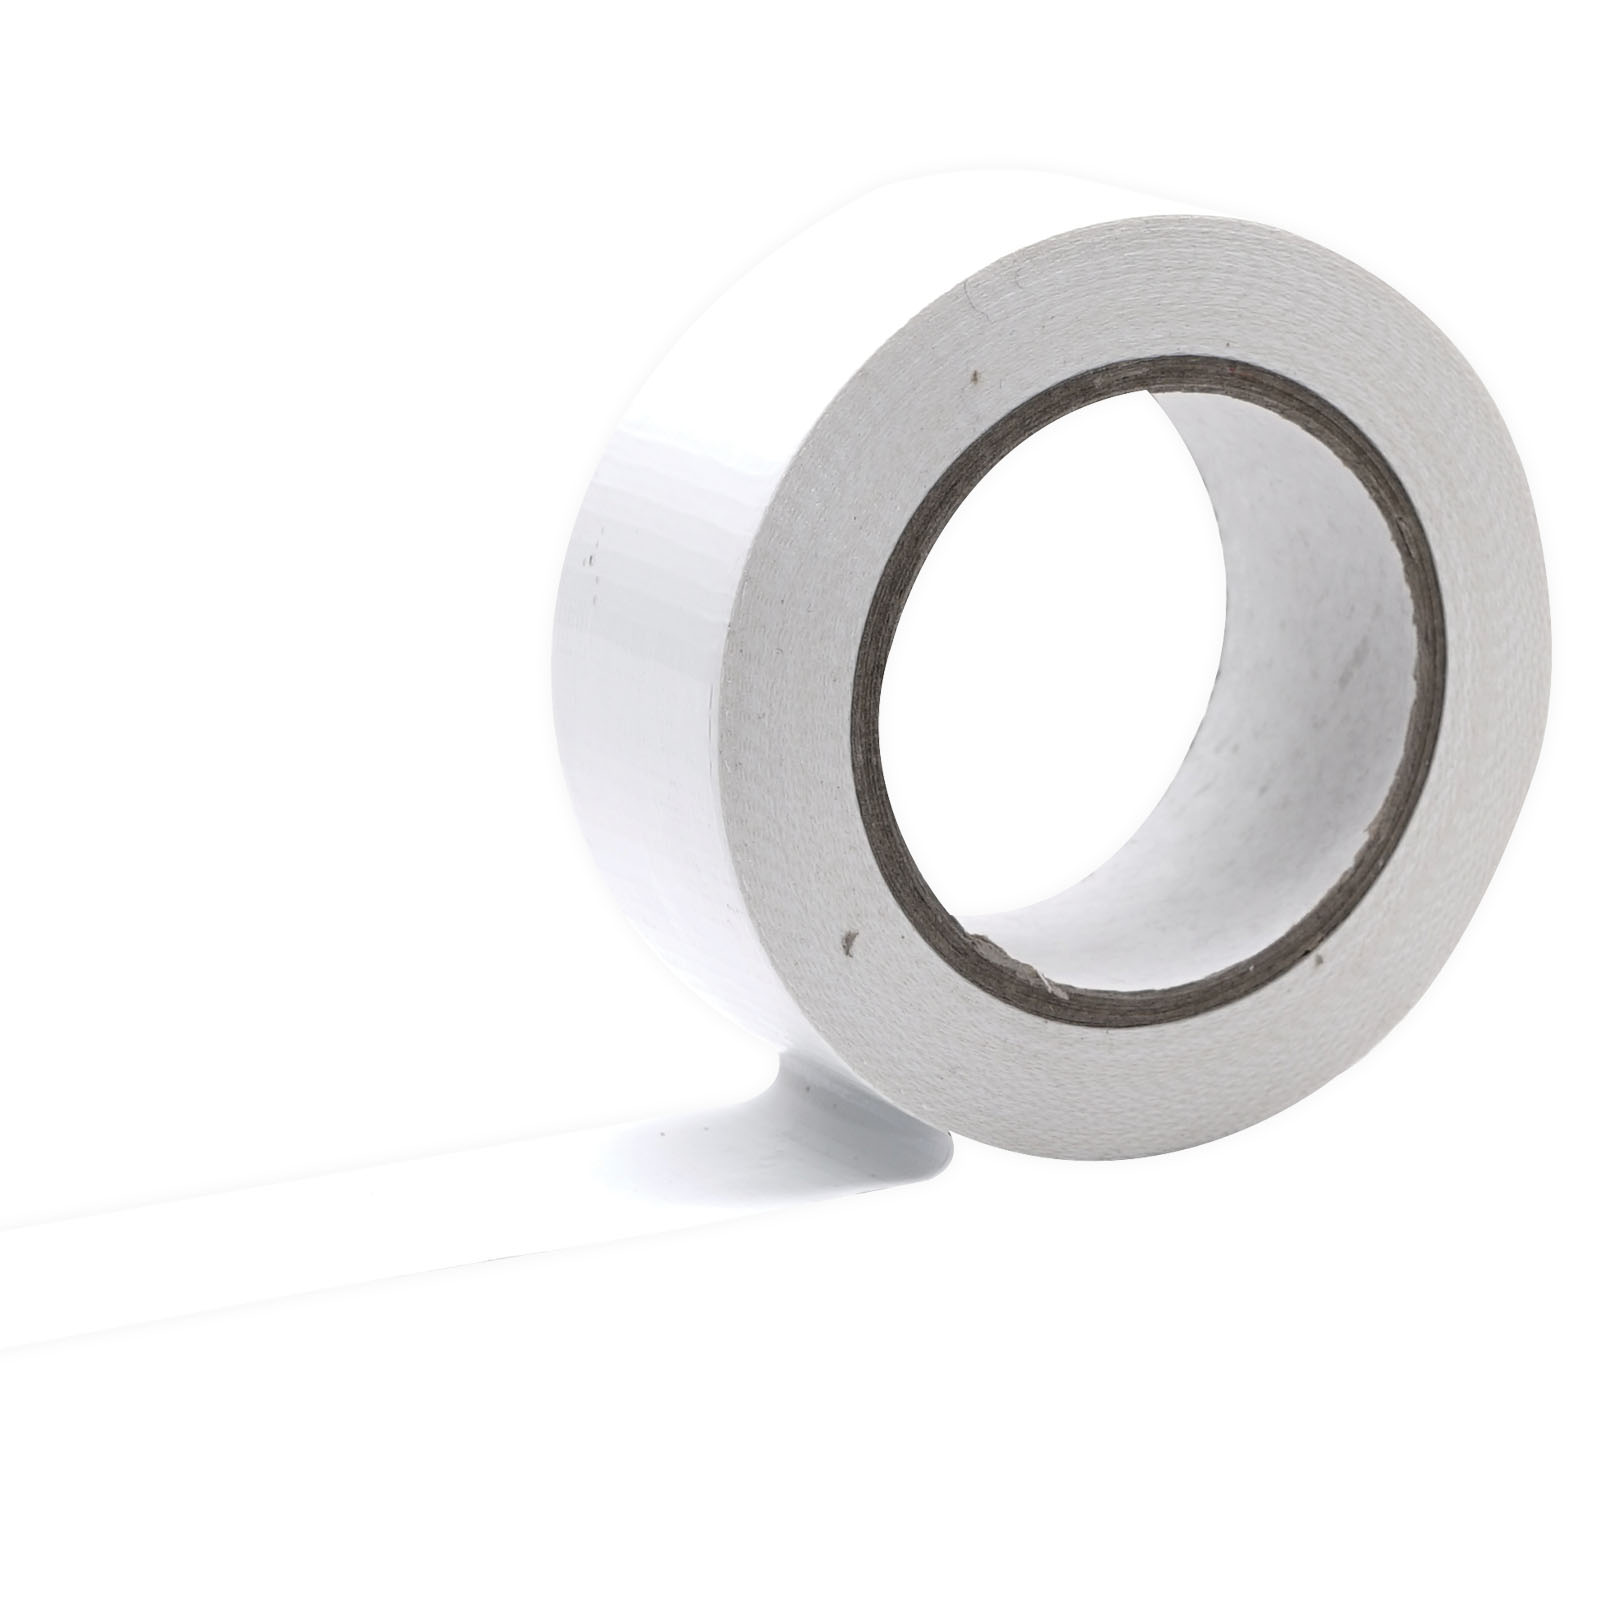 White Cloth Gaffer Tape